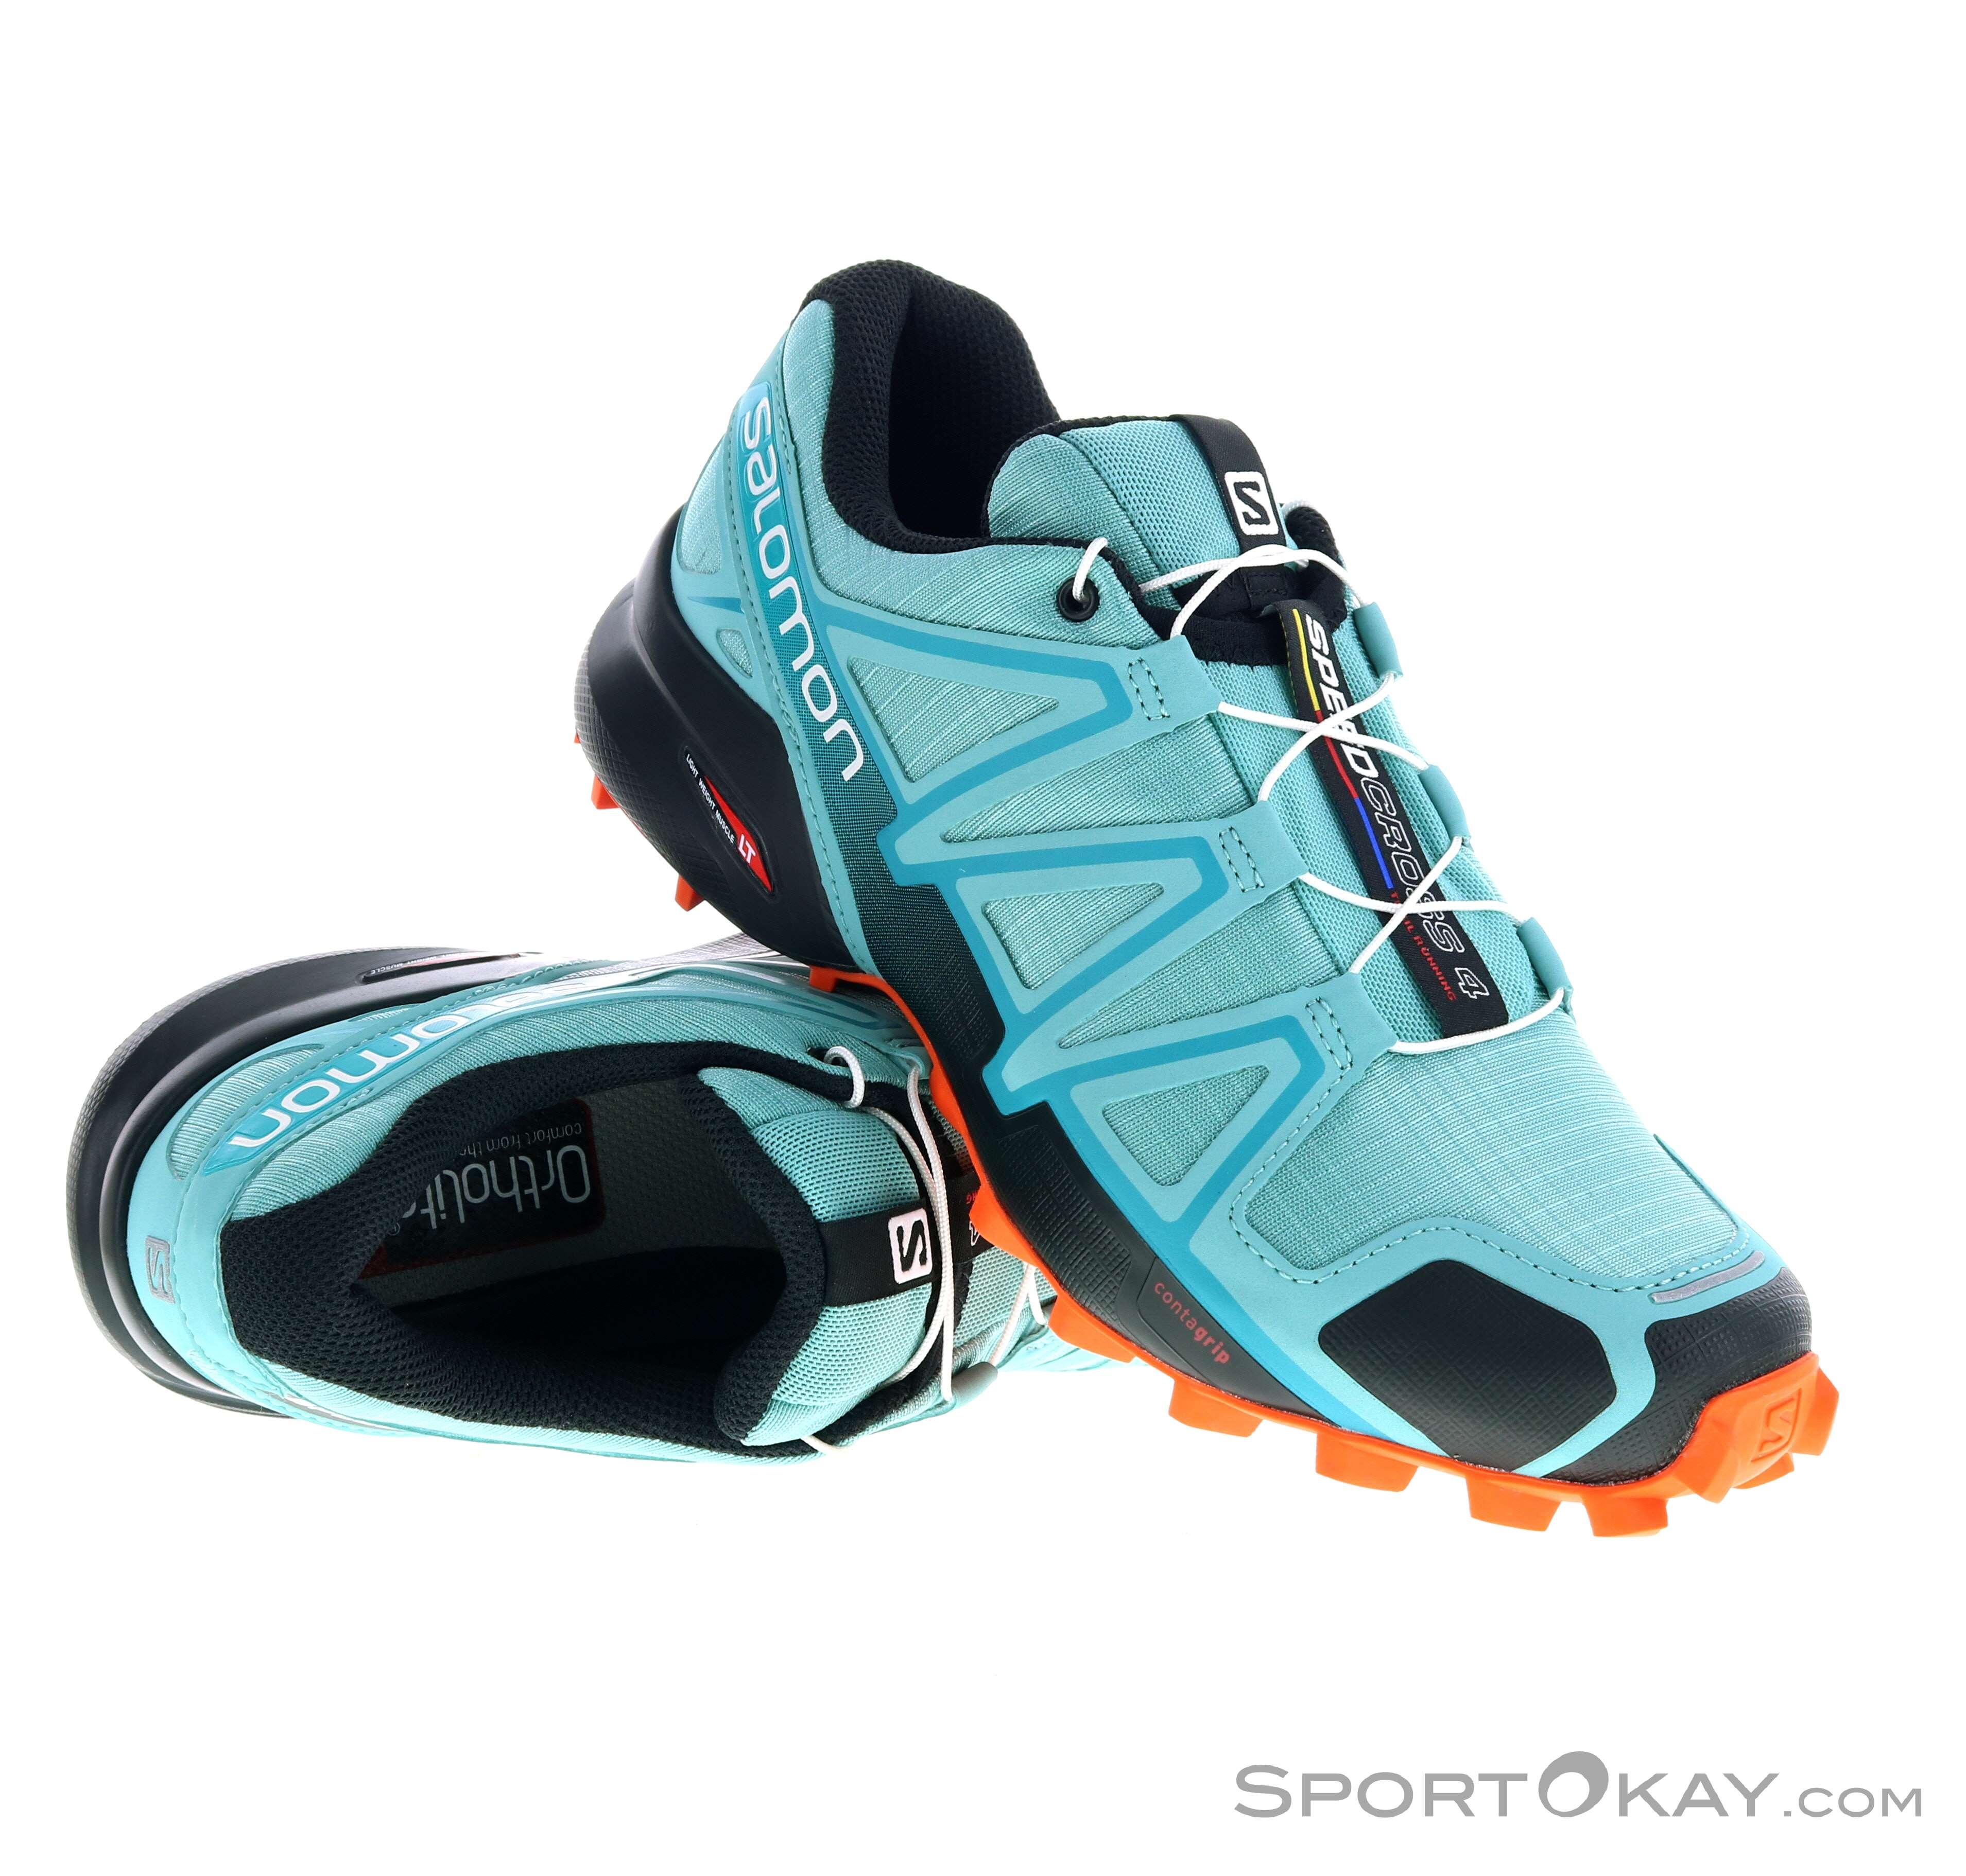 Salomon Speedcross 4 Damen Traillaufschuhe Traillaufschuhe iHDZG